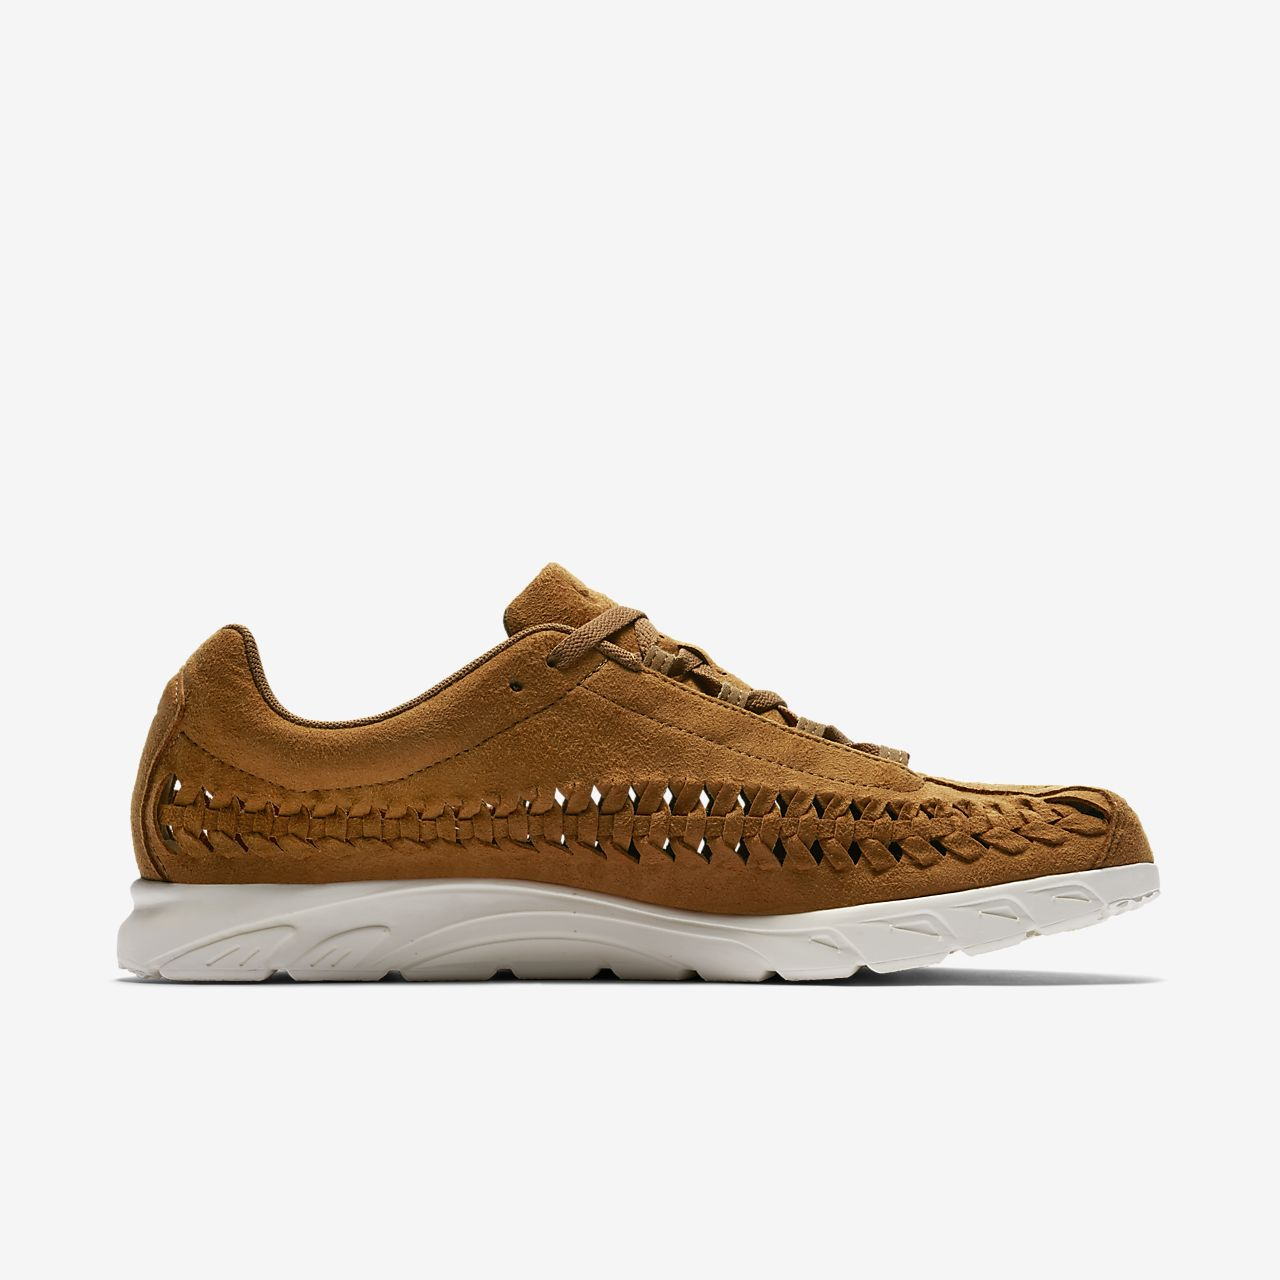 ... Nike Mayfly Woven Men's Shoe